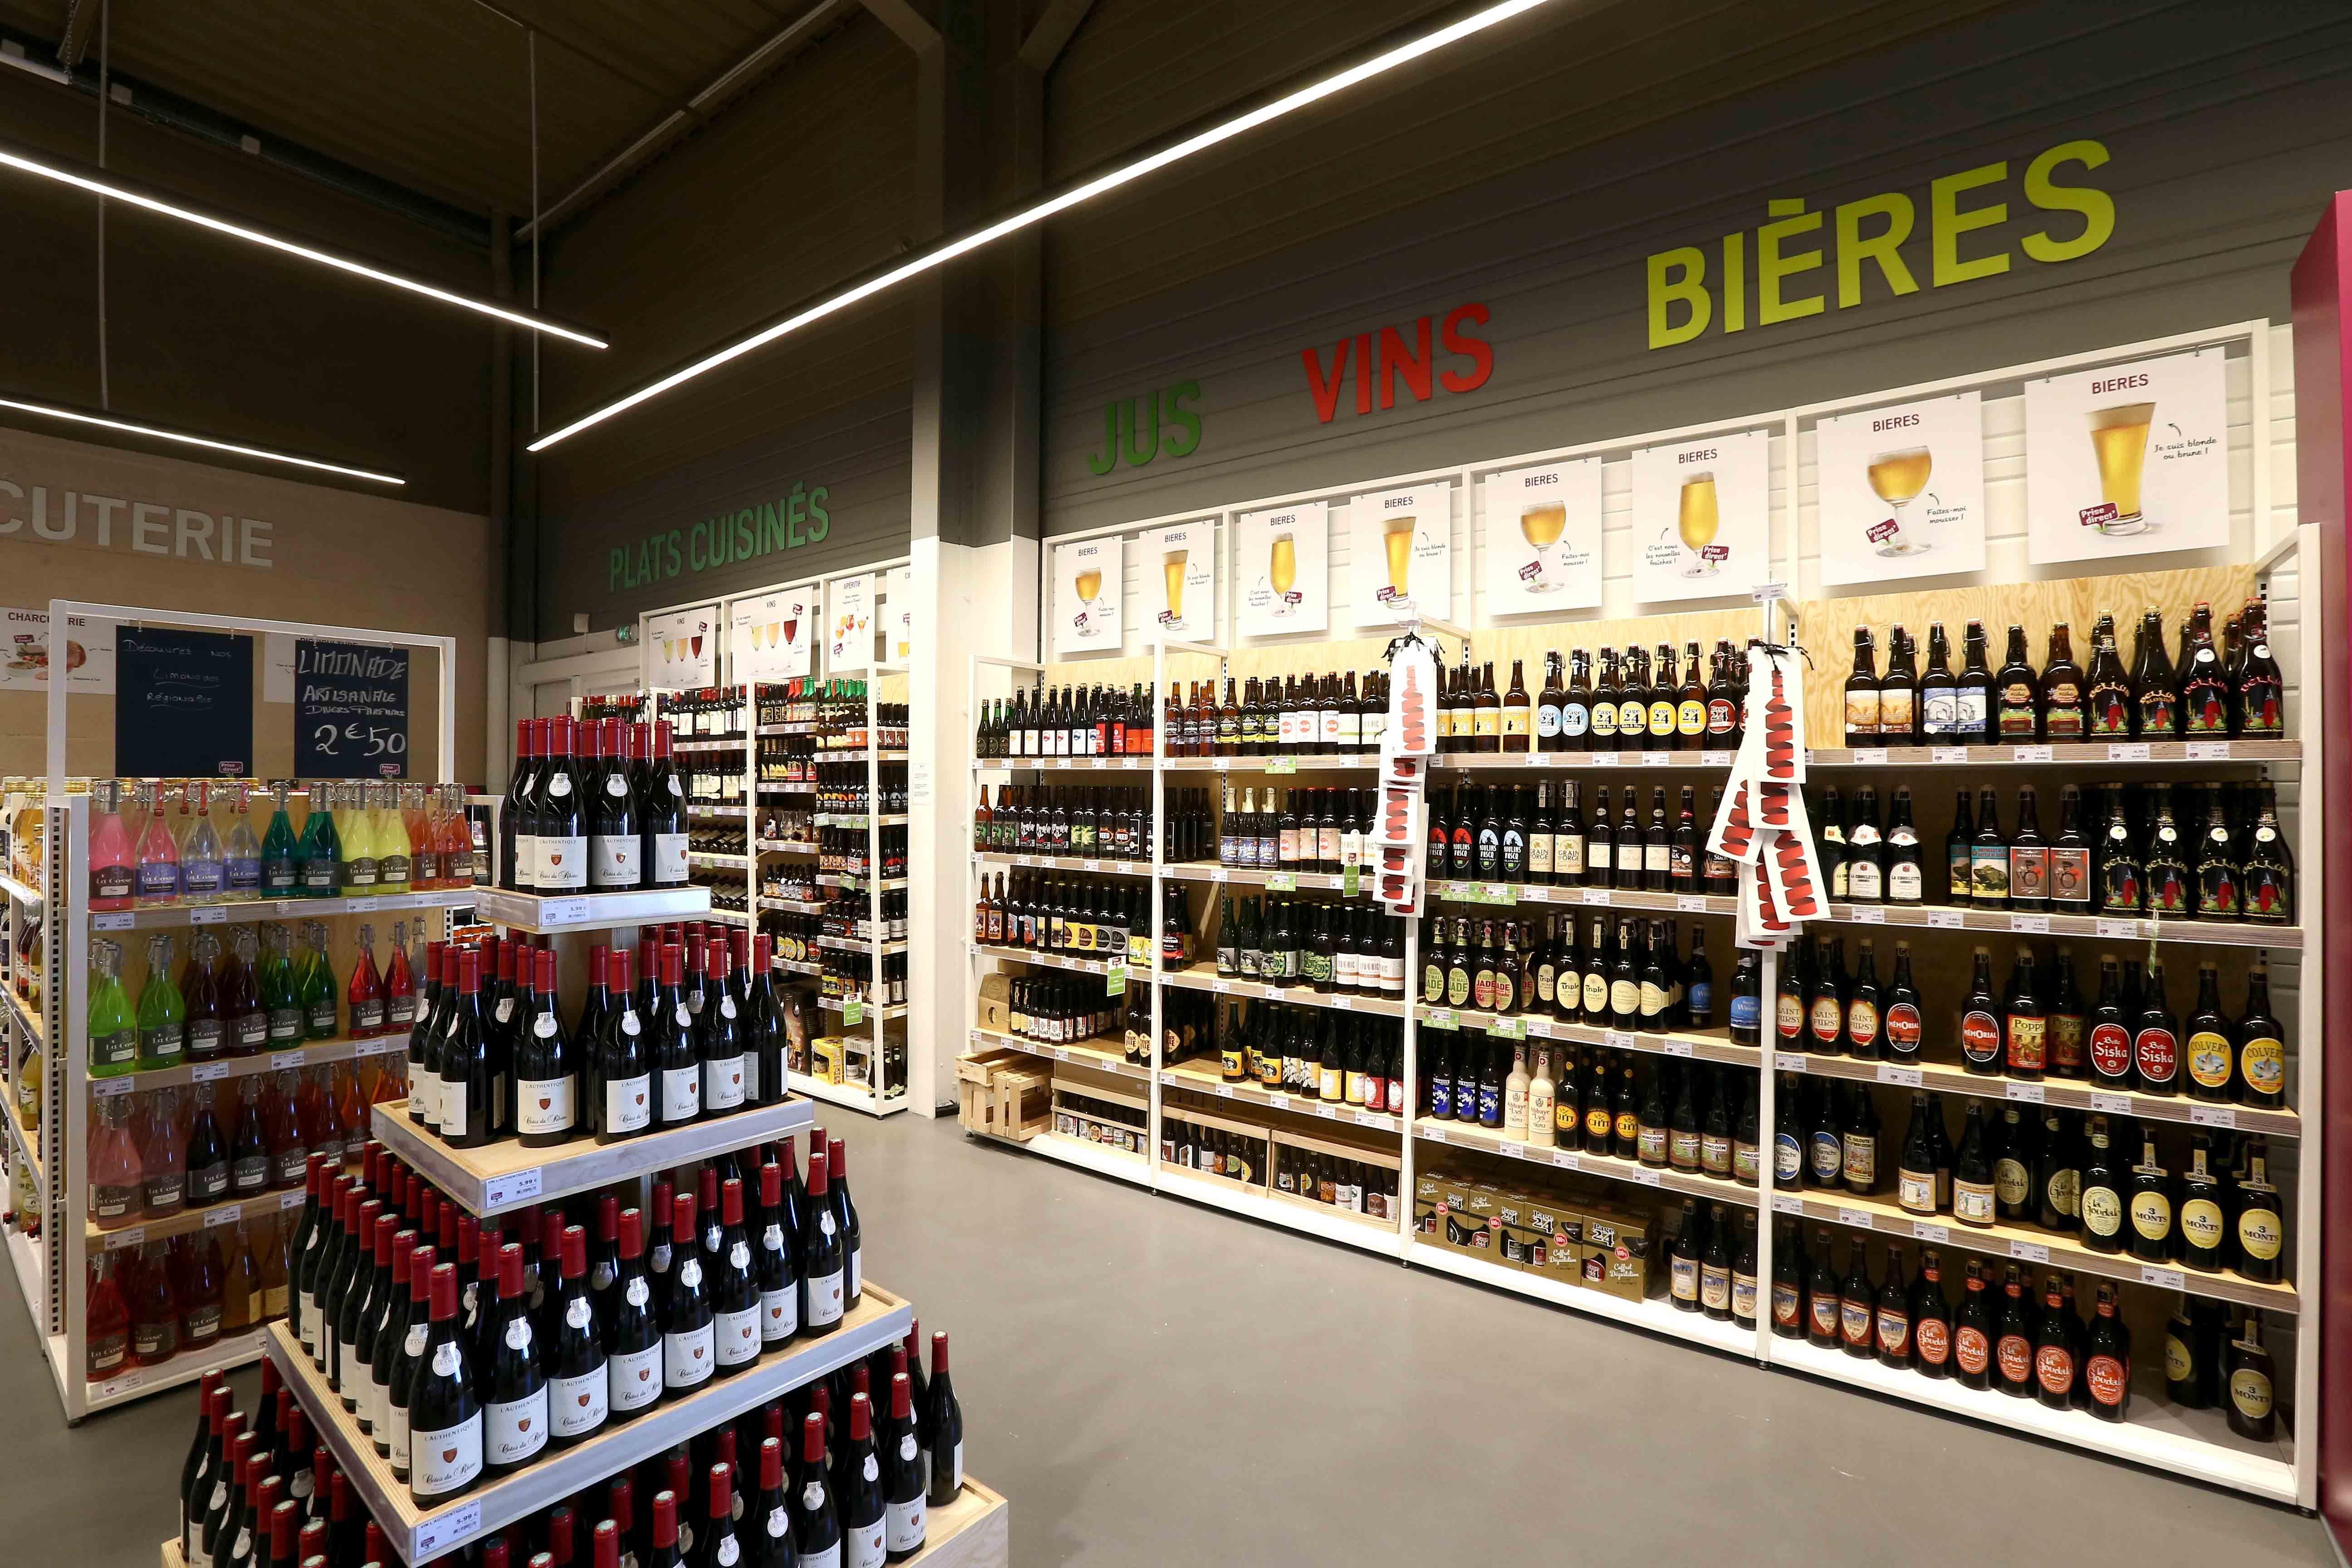 Agencement Magasin Bio Mobilier Specifique Vins Et Bieres Vin Et Biere Agencement Magasin Magasin Bio